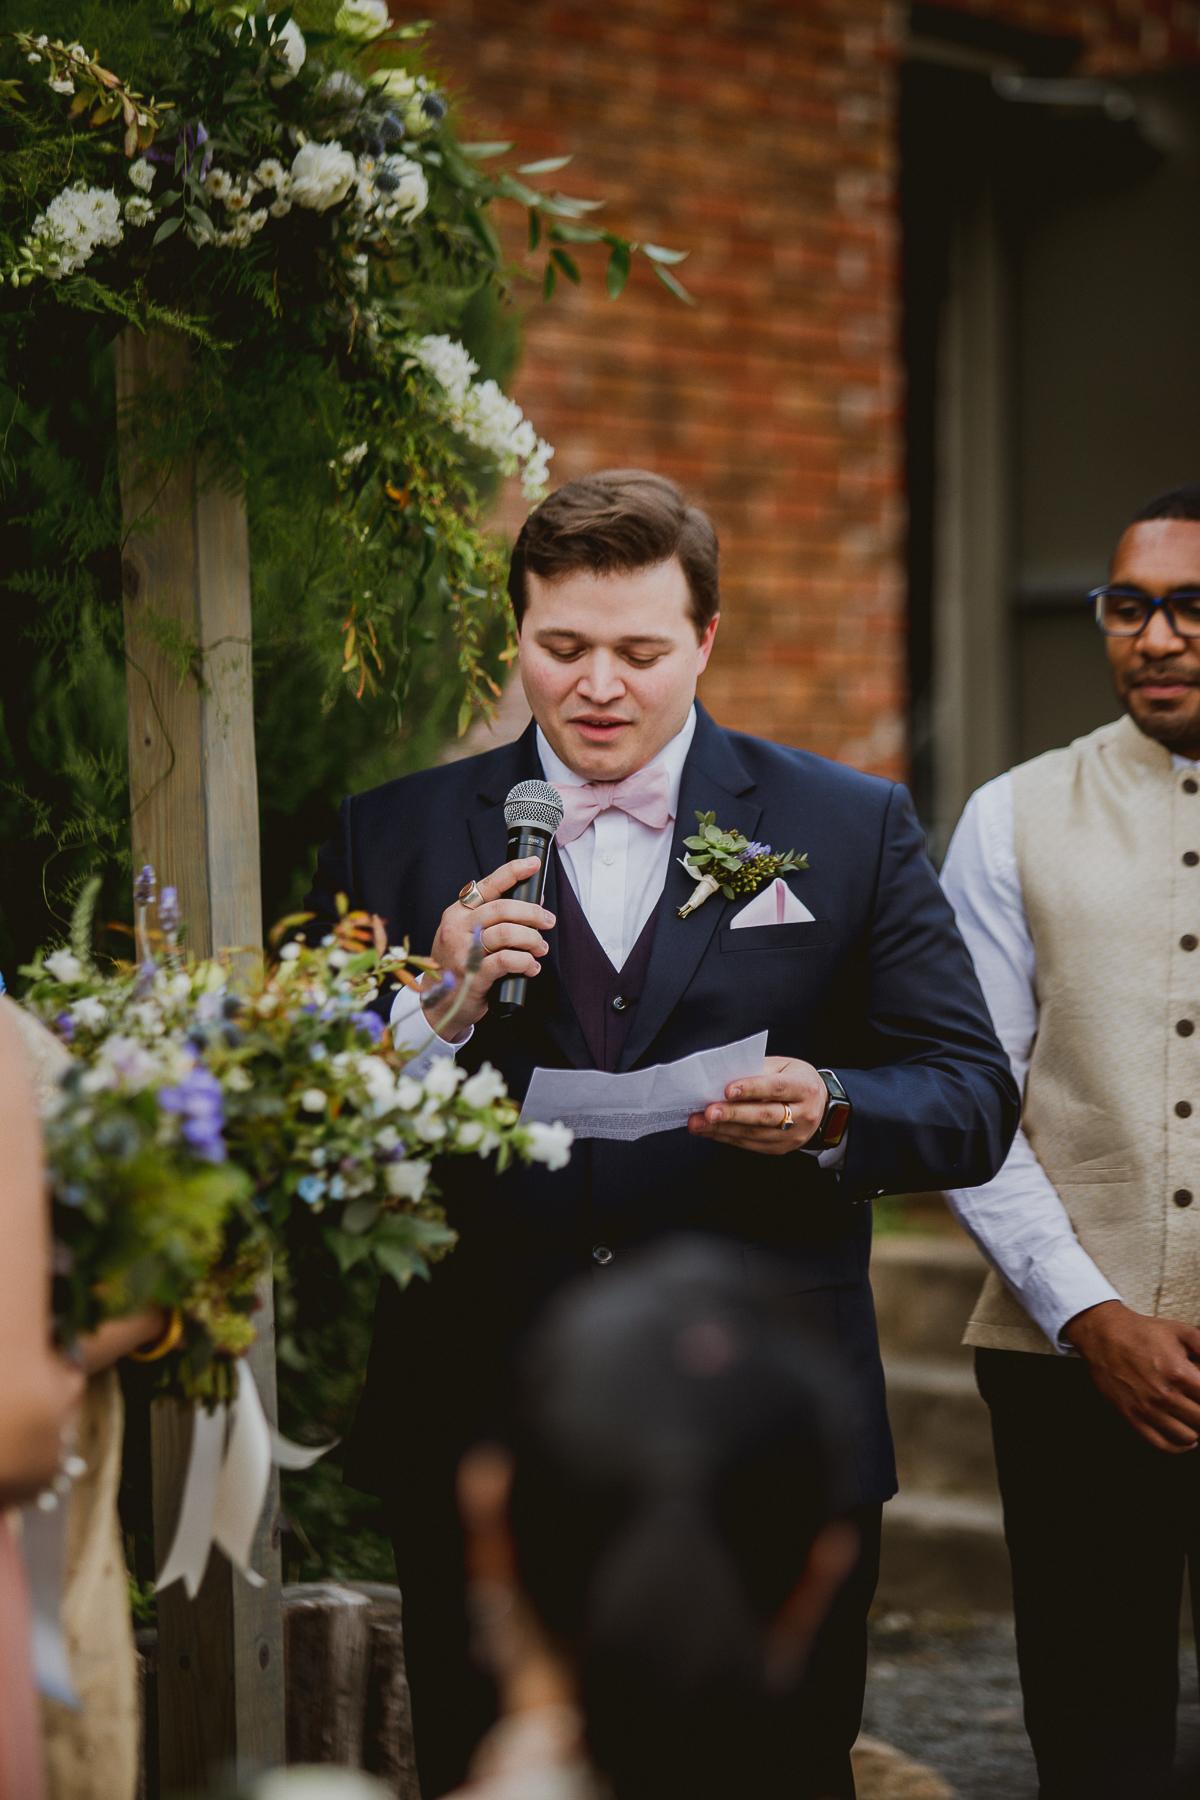 eventide-brewery-indian-american-fusion-kelley-raye-atlanta-los-angeles-wedding-photographer-62.jpg